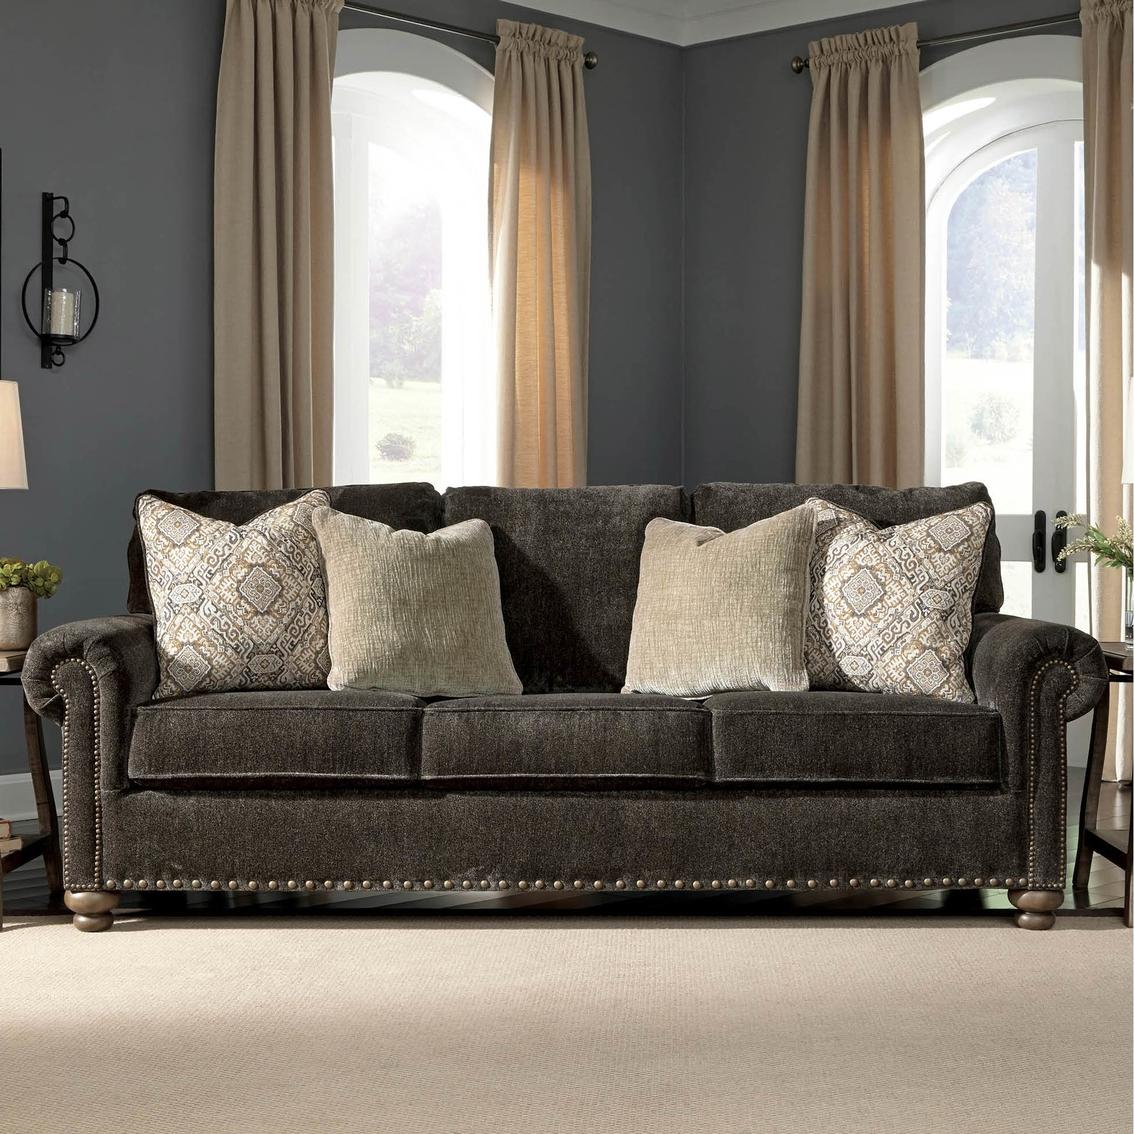 Signature Design By Ashley Stracelen Queen Sofa Sleeper Sofas